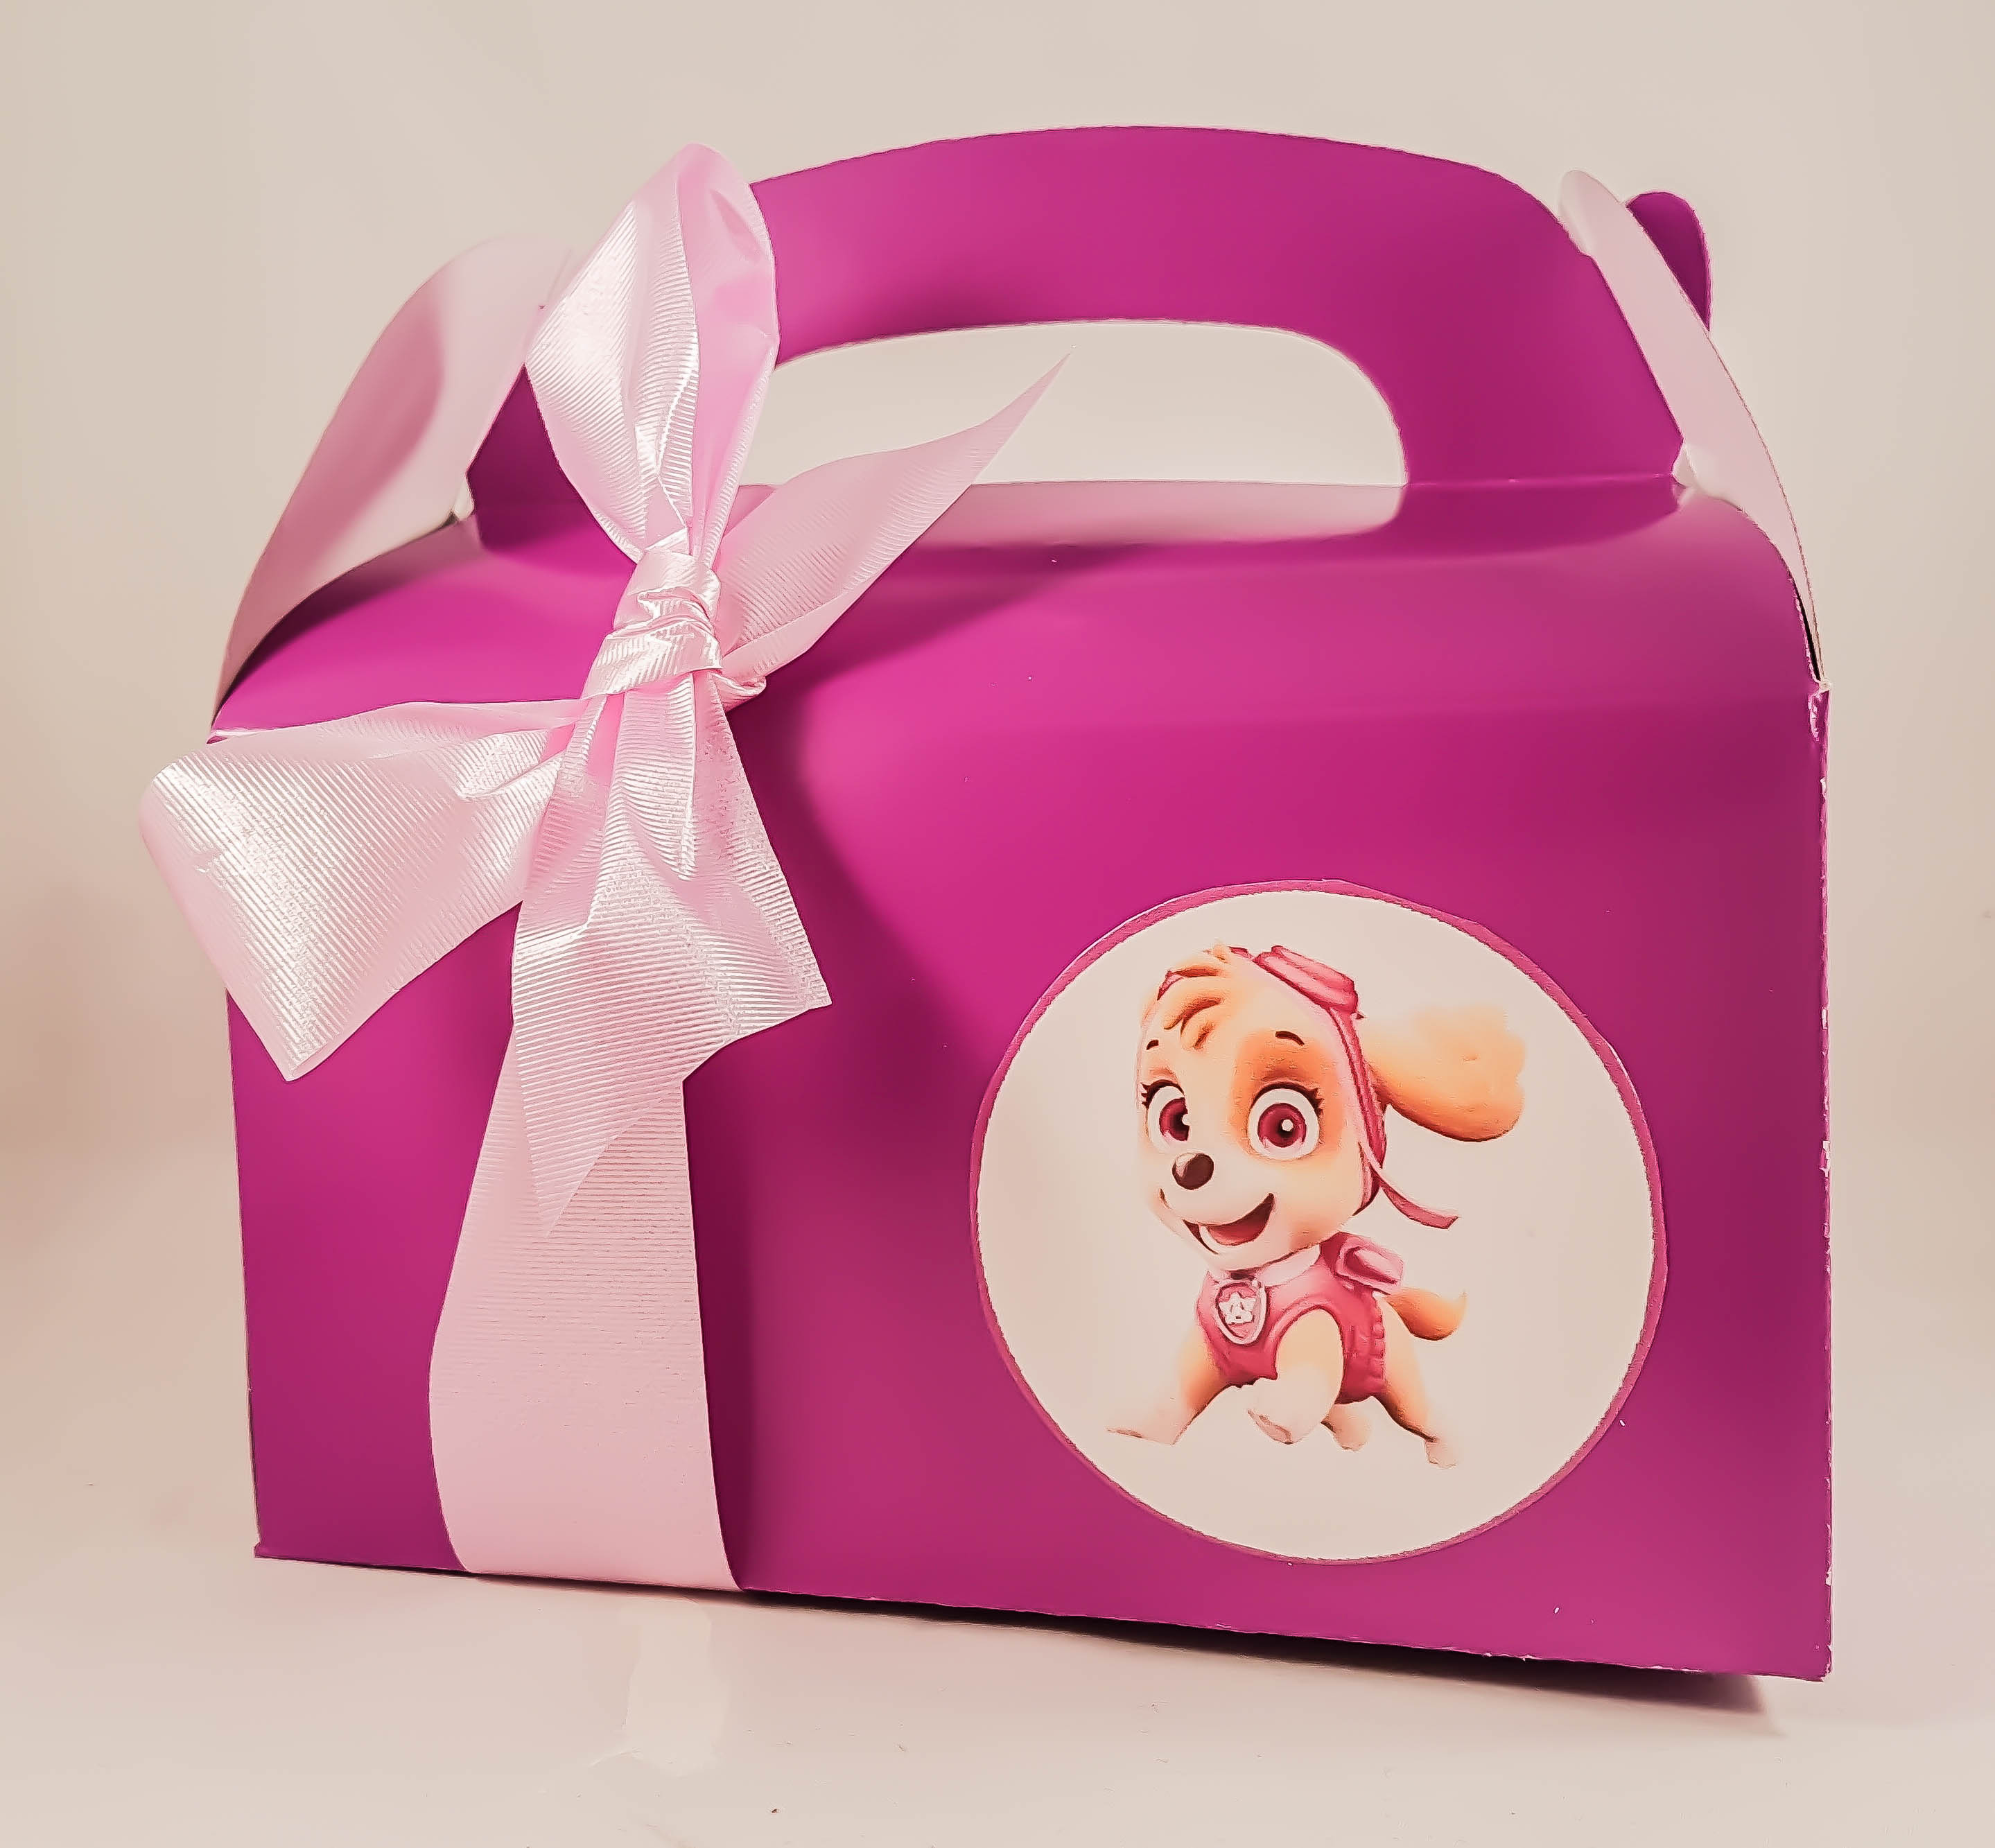 First Birthday Boy Party Loot Bag Single: Kids Birthday Party Loot Bag Paw Patrol Planes Cars And